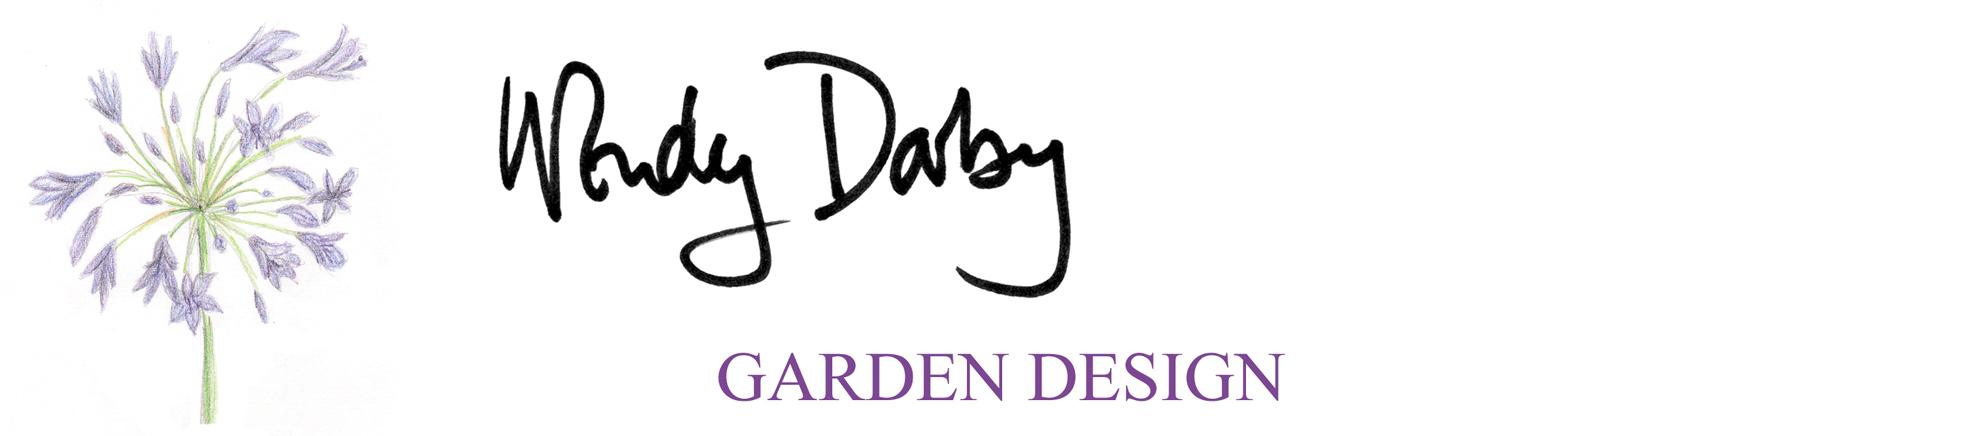 Wendy Darby Logo